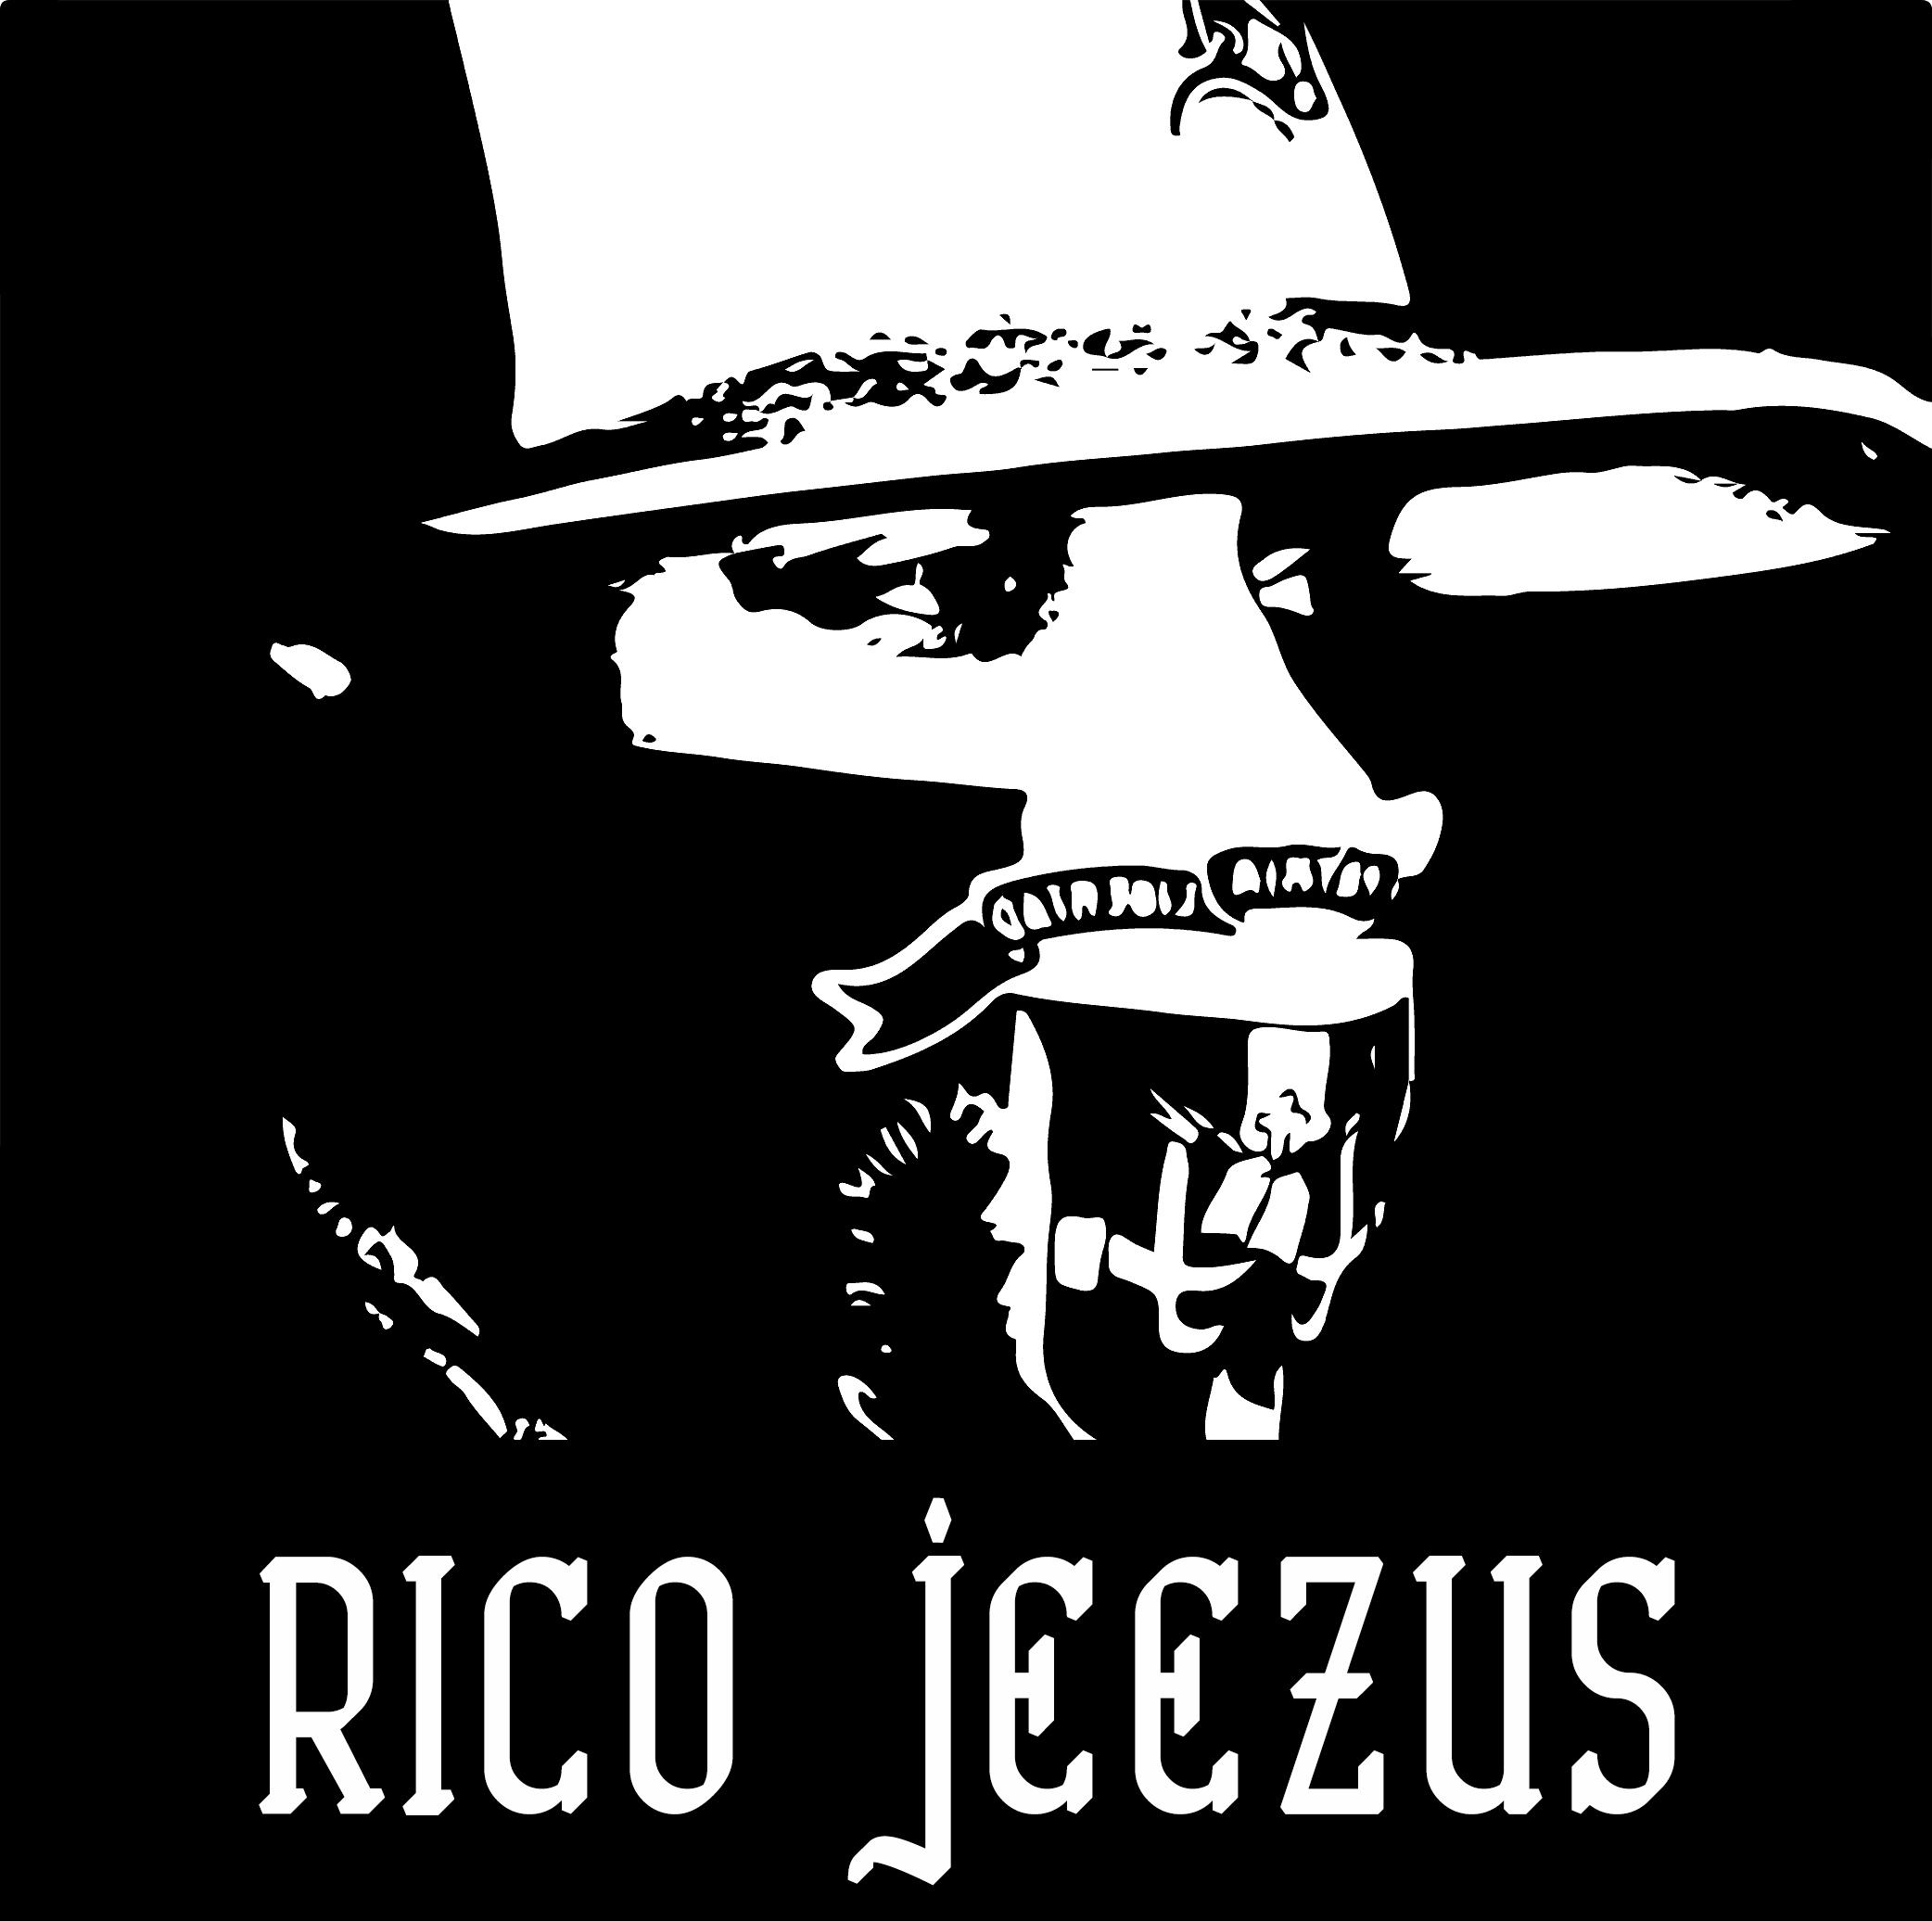 Rico Jeezus – A Misanthropist Heaven